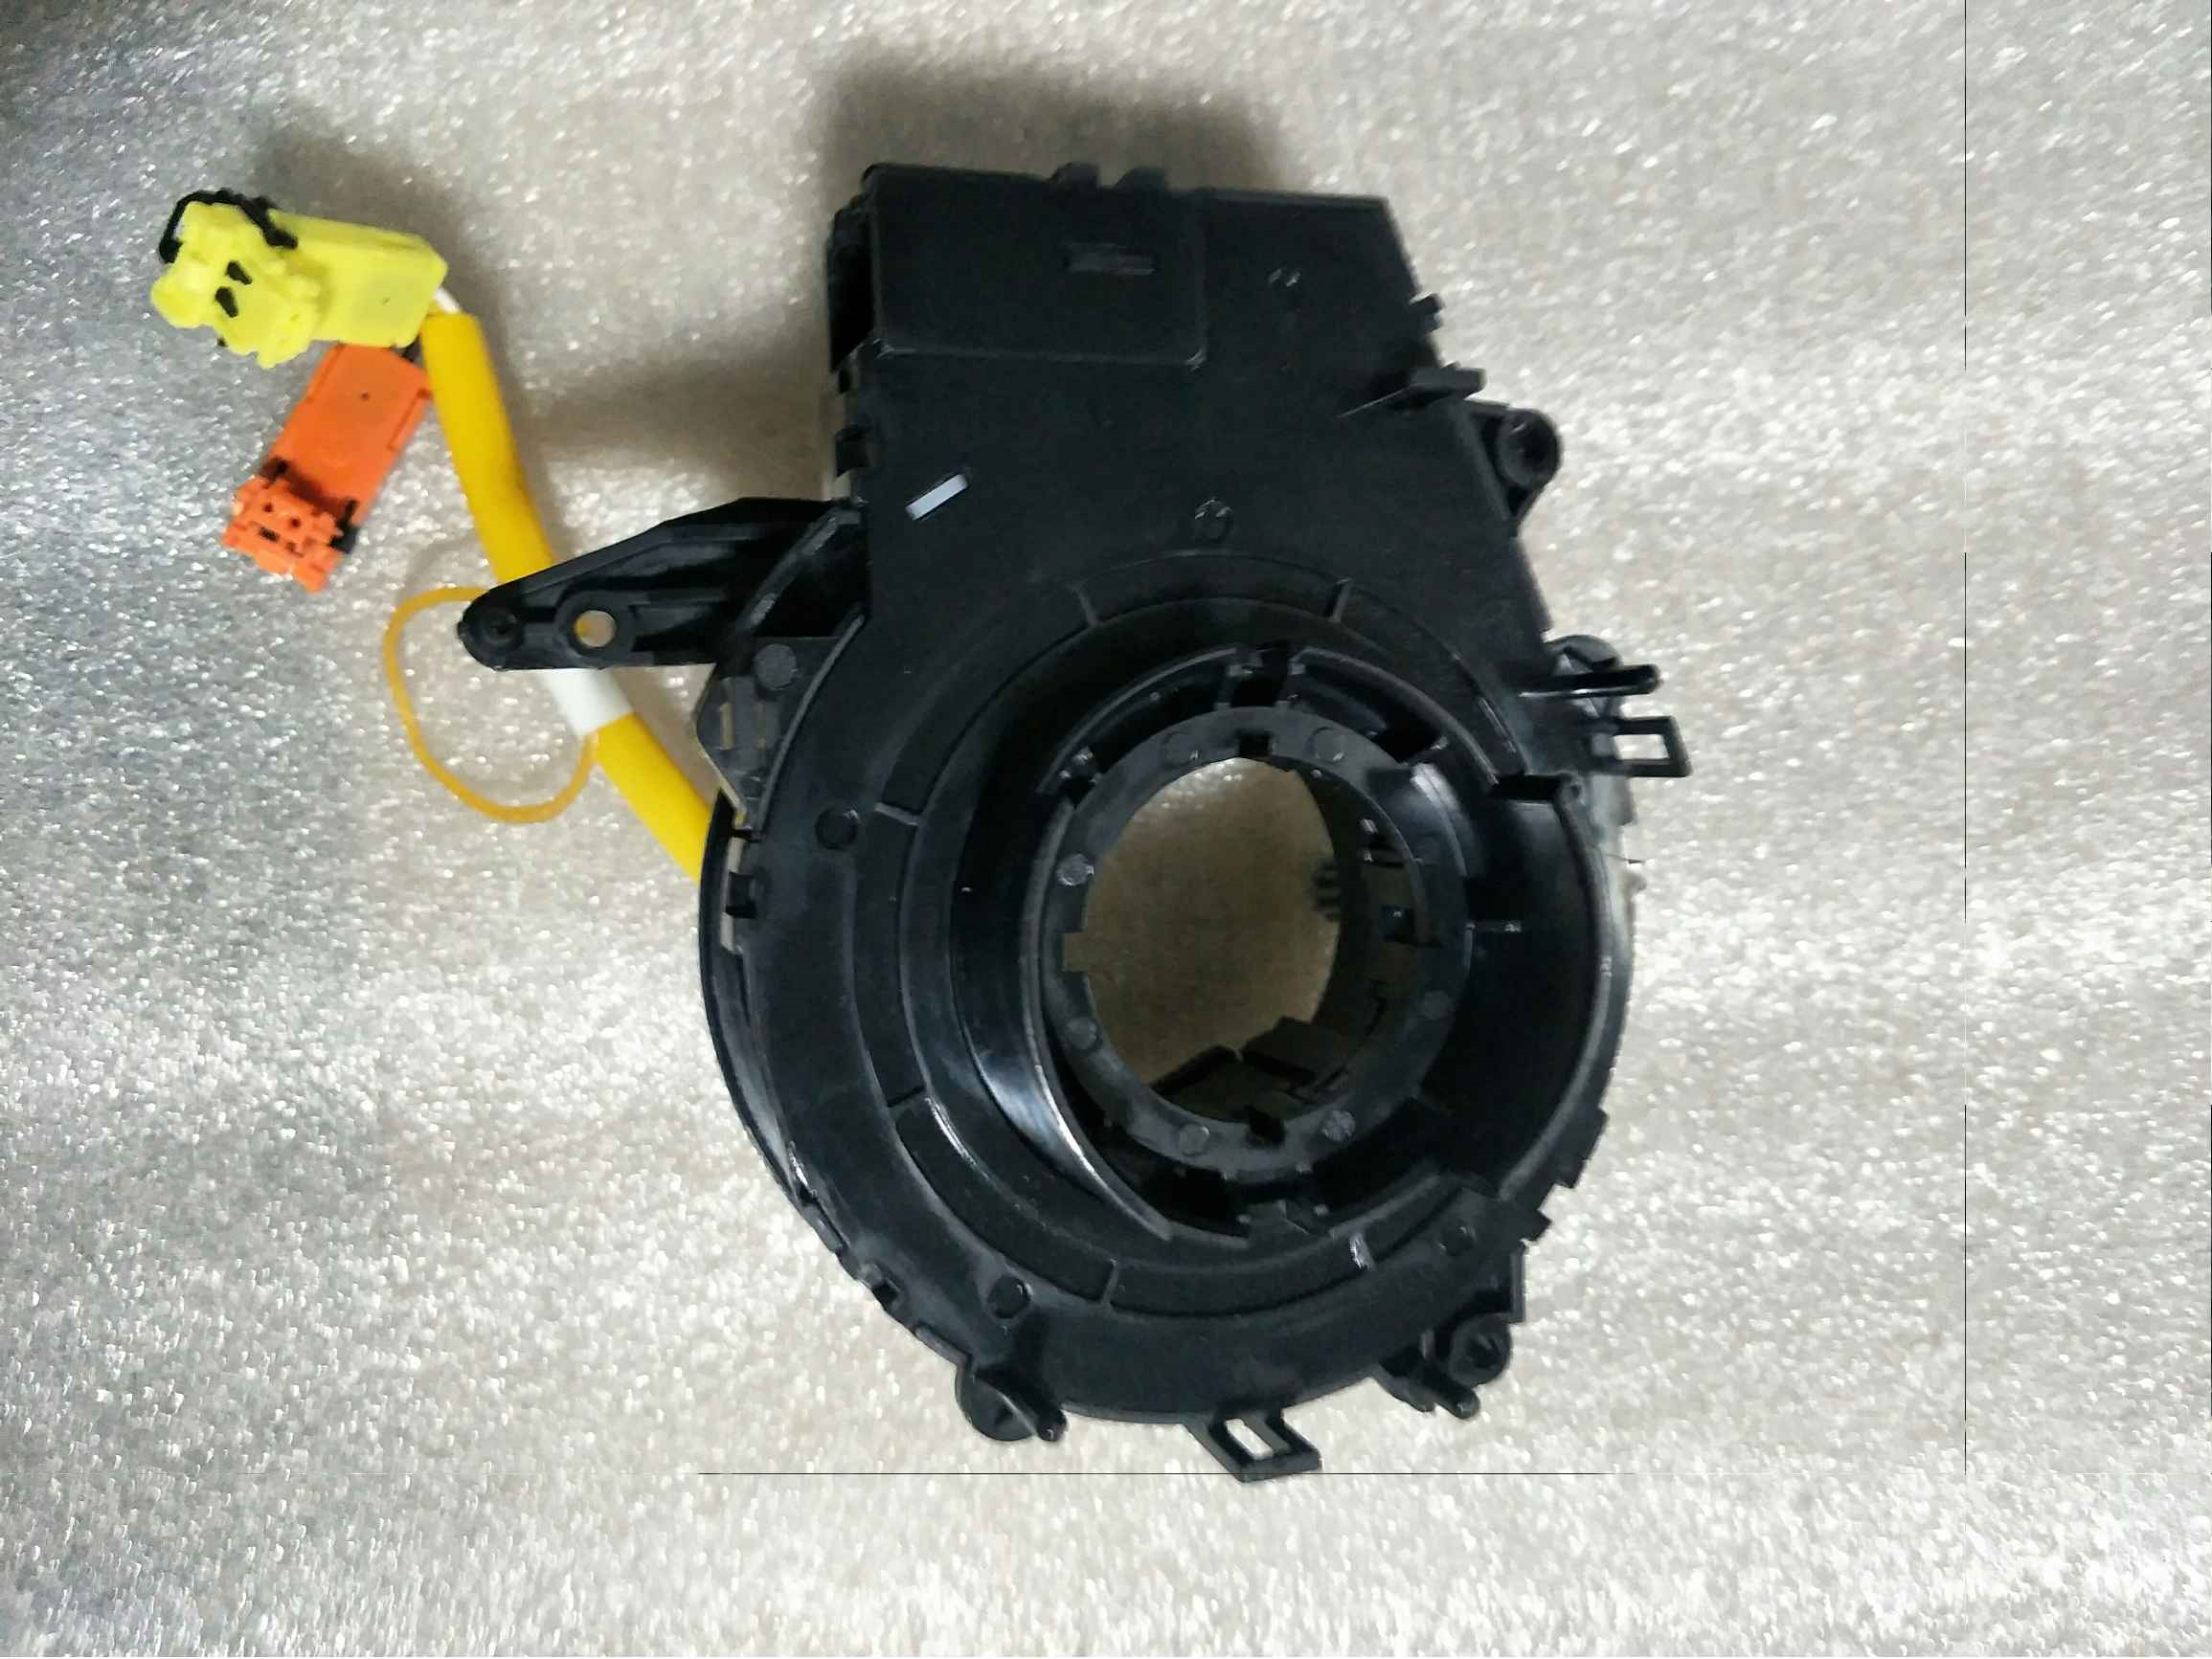 BP4K-66-CS0  High Quailty Combination Switch Coil For  Mazda 3 2004-2009 Double Plug BP4K66CS0